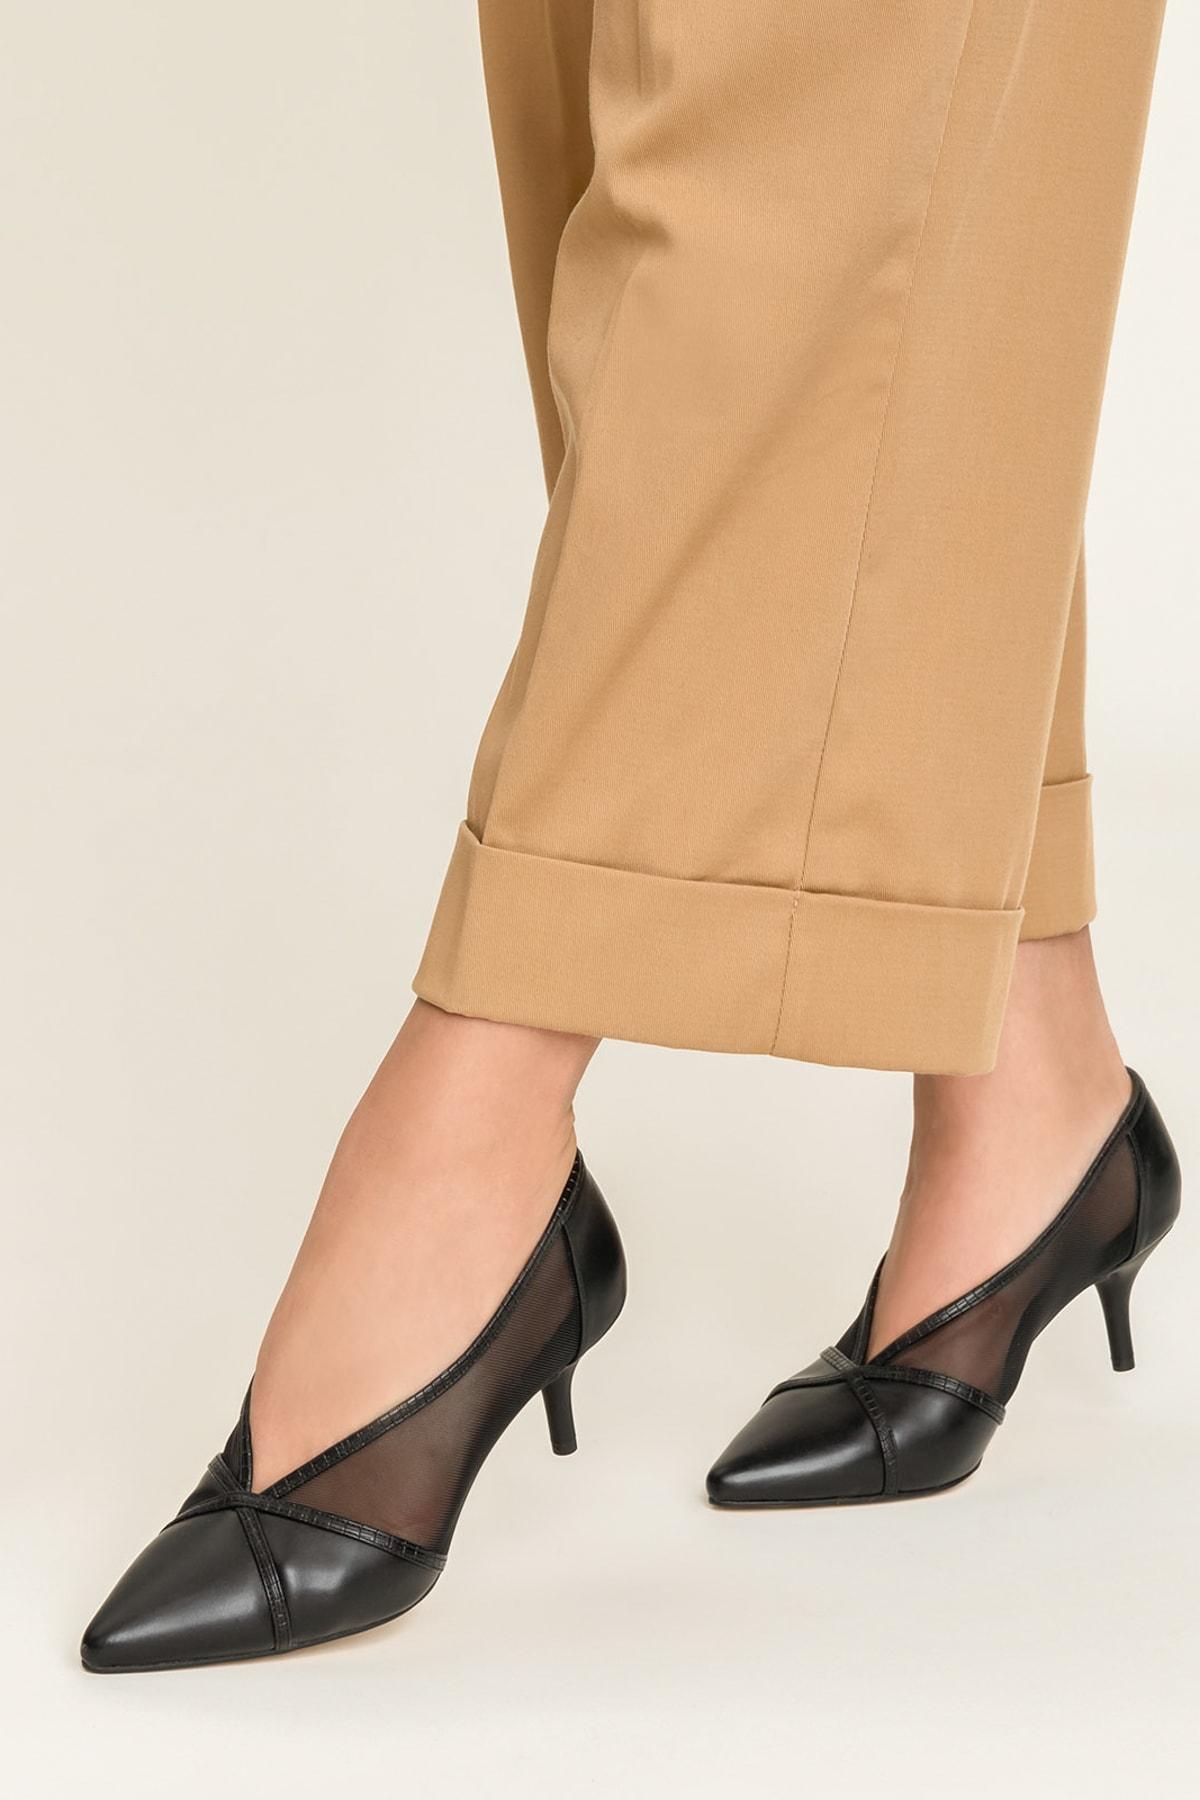 Elle Shoes MIKENNAA Siyah Kadın Ayakkabı 1